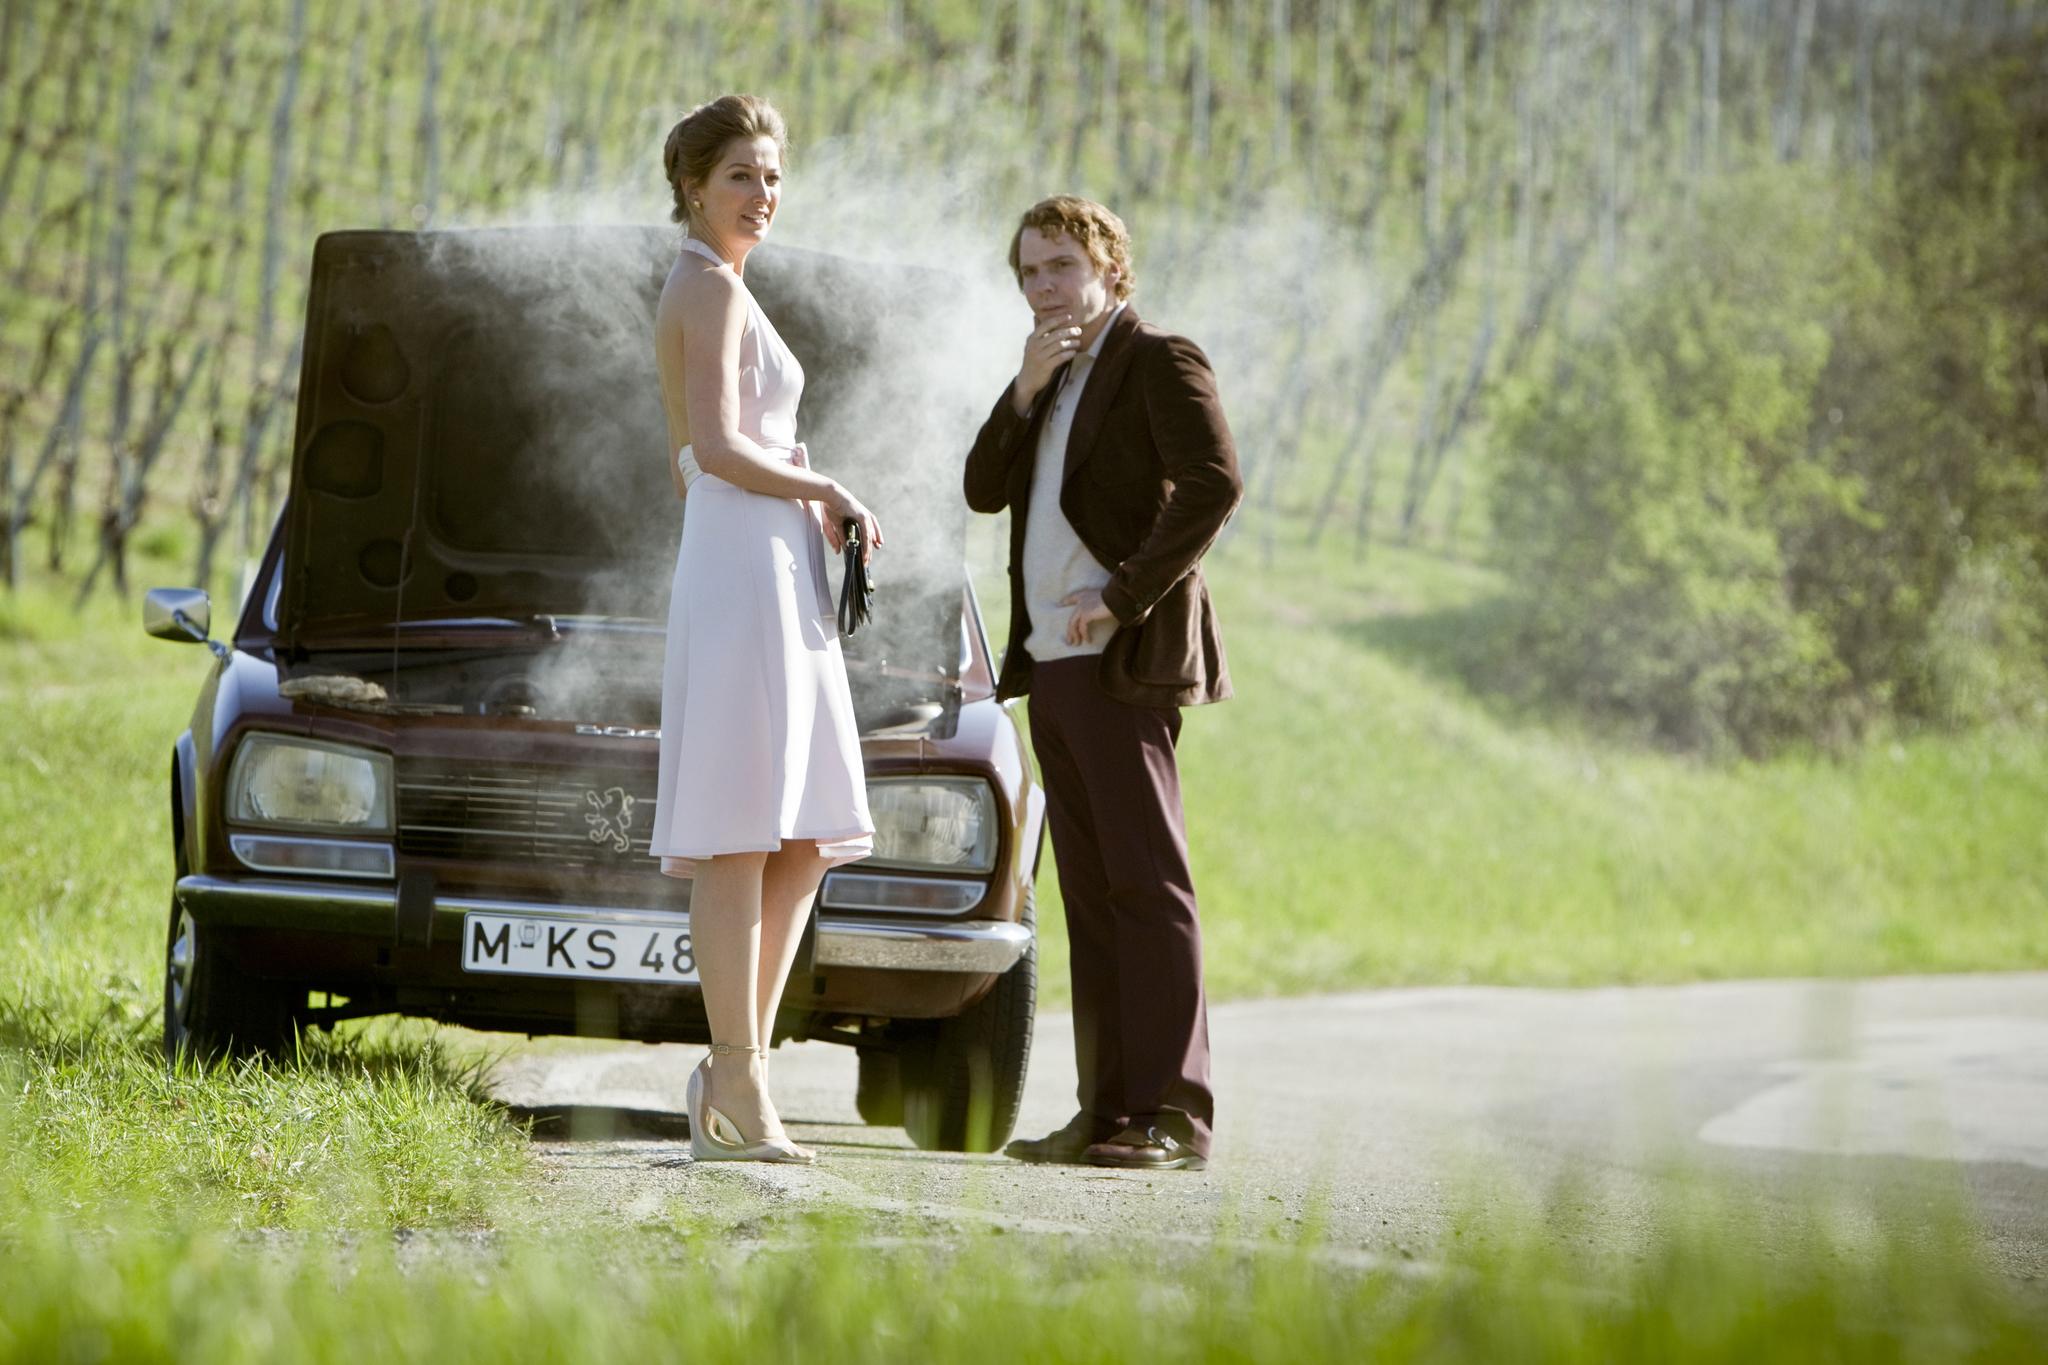 Daniel Brühl and Alexandra Maria Lara in Rush (2013)